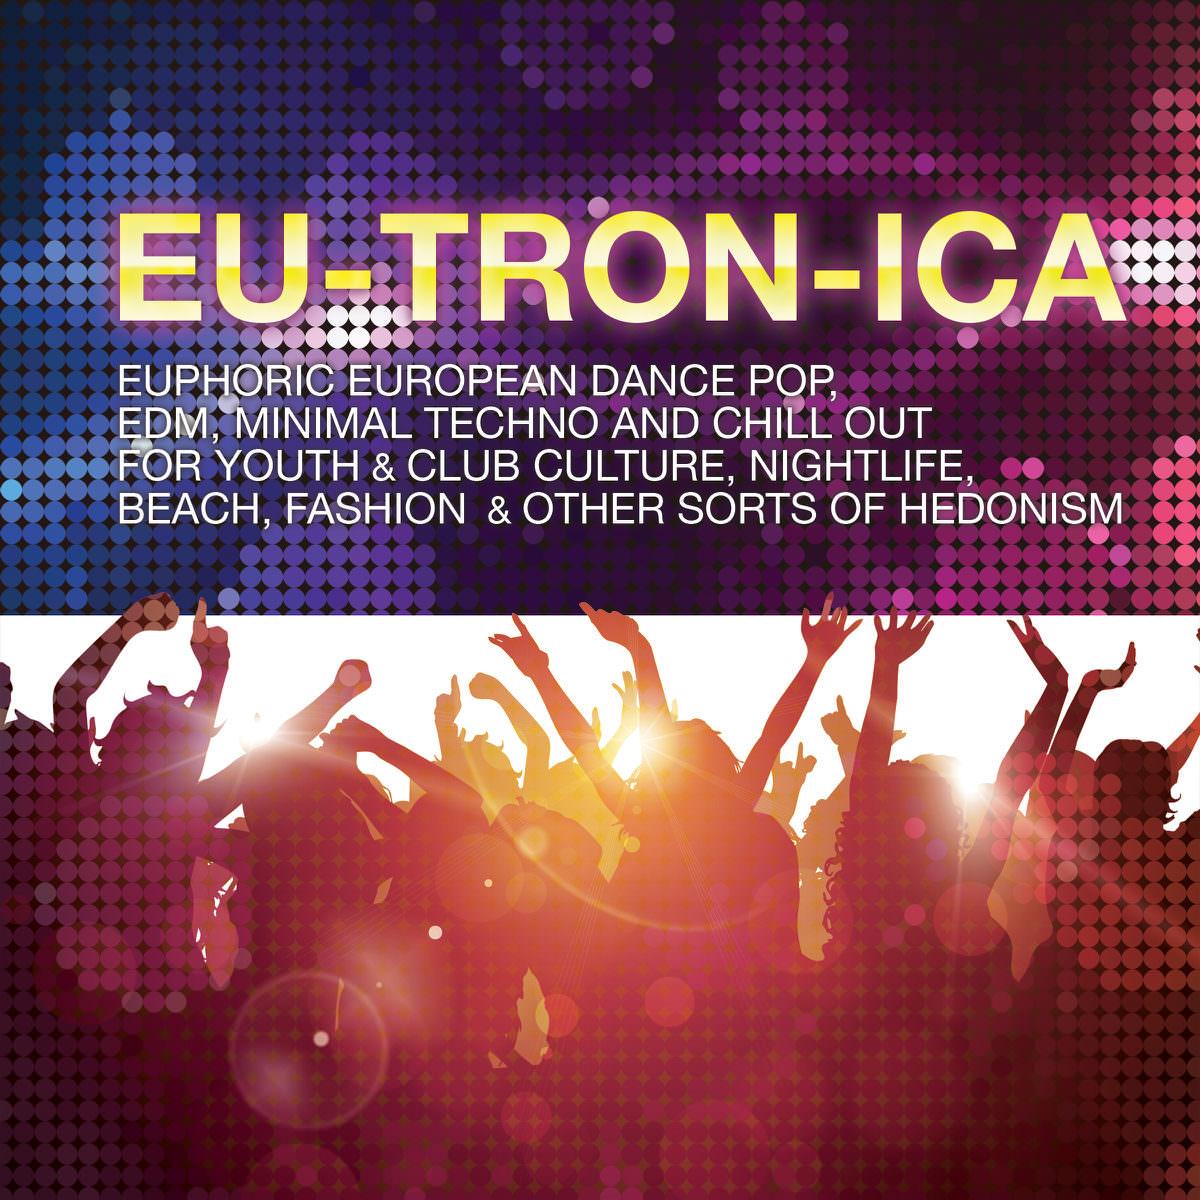 eutronica-h1200